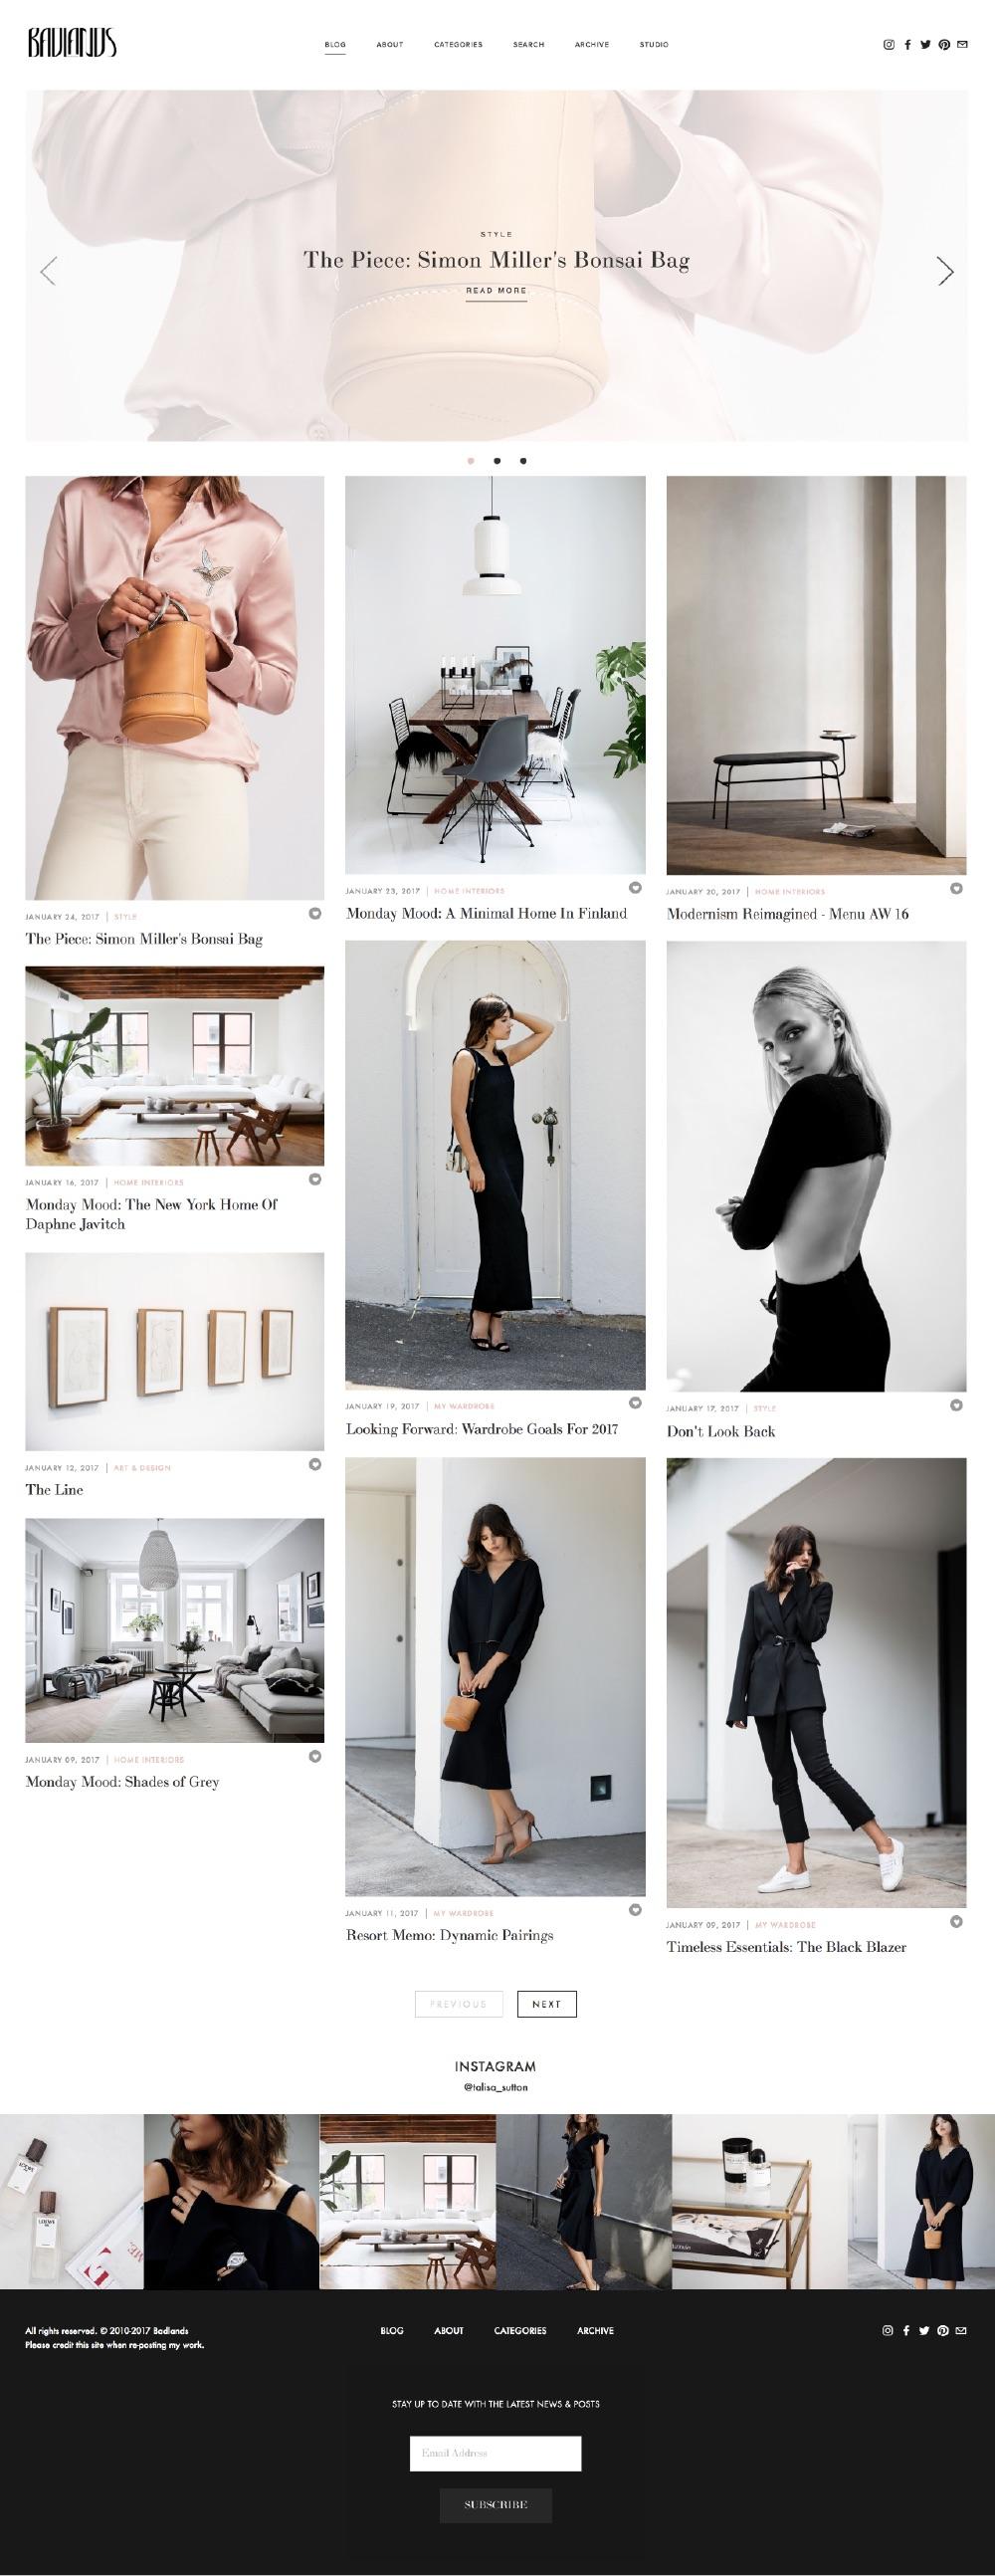 10 best example squarespace websites blog edition paige brunton squarespace expert. Black Bedroom Furniture Sets. Home Design Ideas